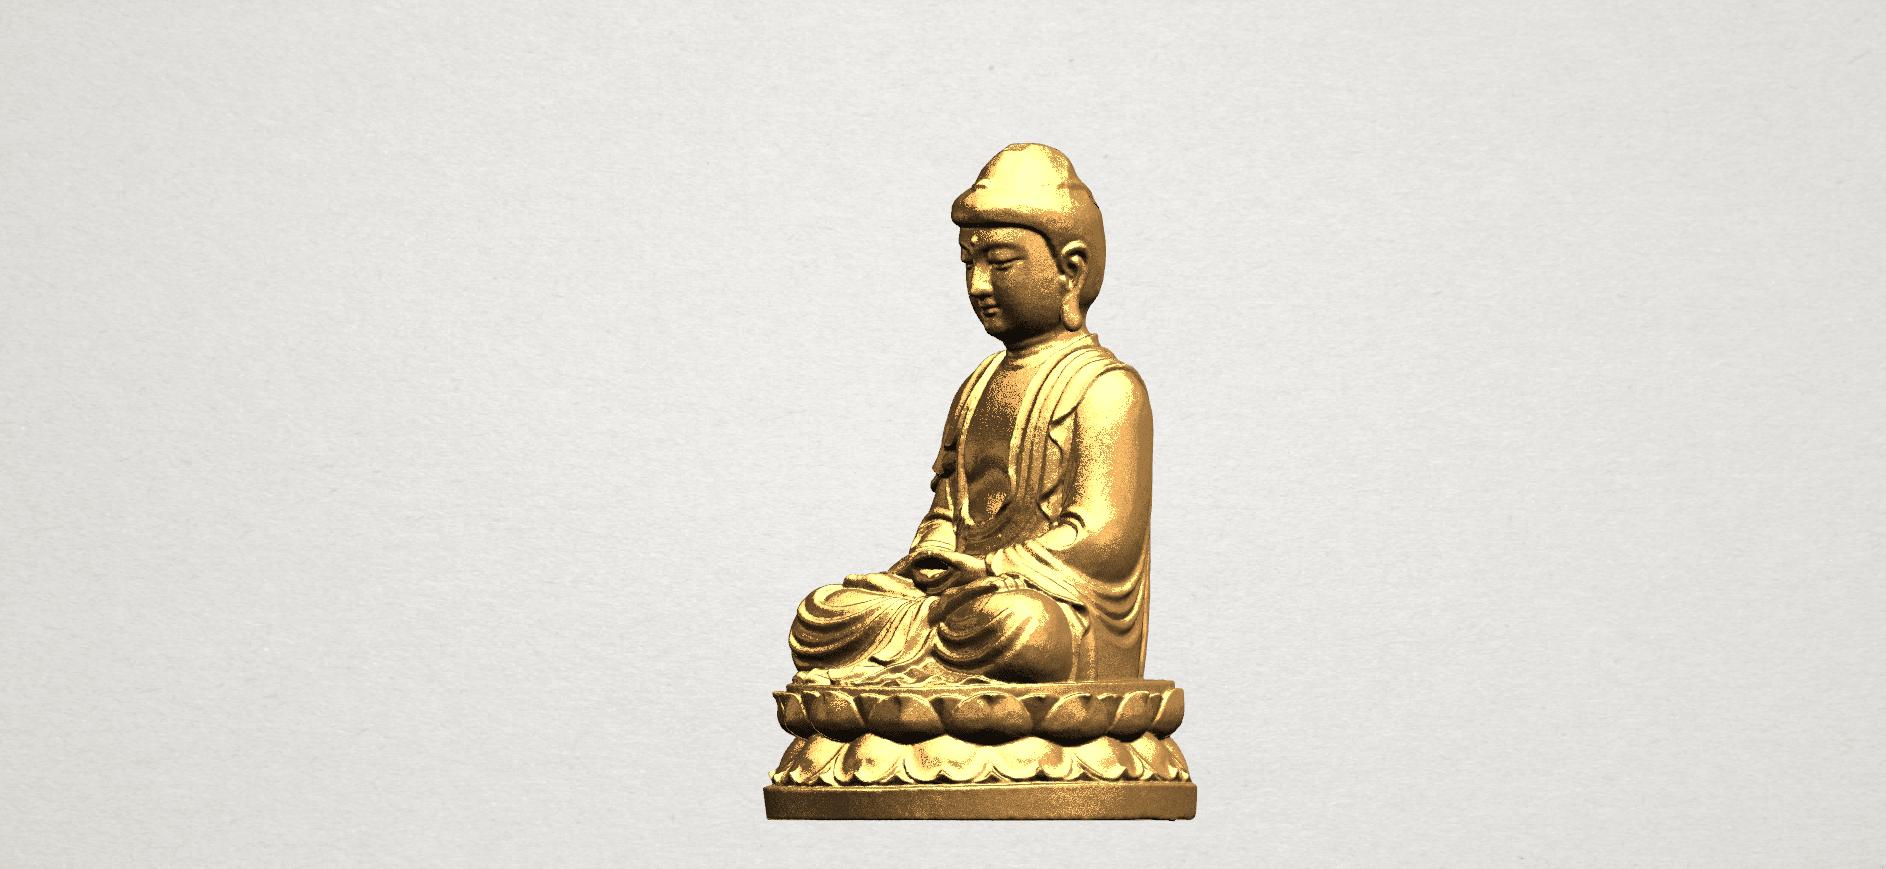 Gautama Buddha young - C02.png Télécharger fichier STL gratuit Gautama Bouddha Bouddha • Objet imprimable en 3D, GeorgesNikkei